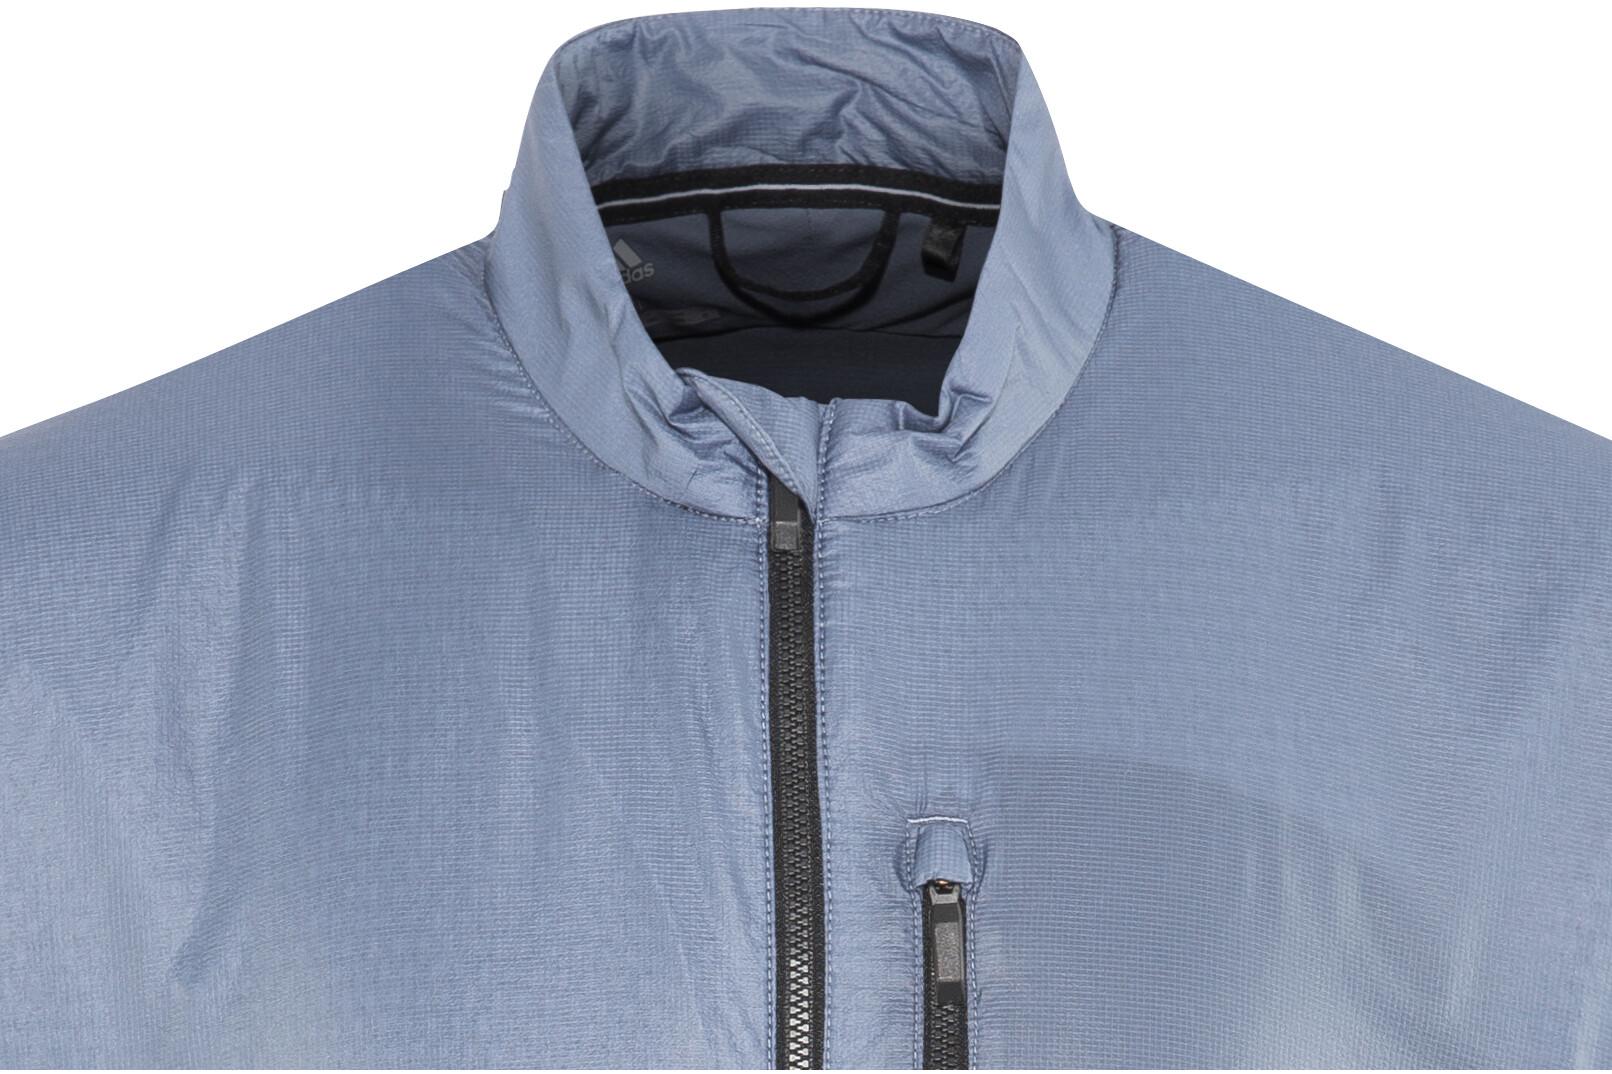 adidas TERREX Agravic Alpha Shield Jacket Men raw steel günstig ... 4c536191db